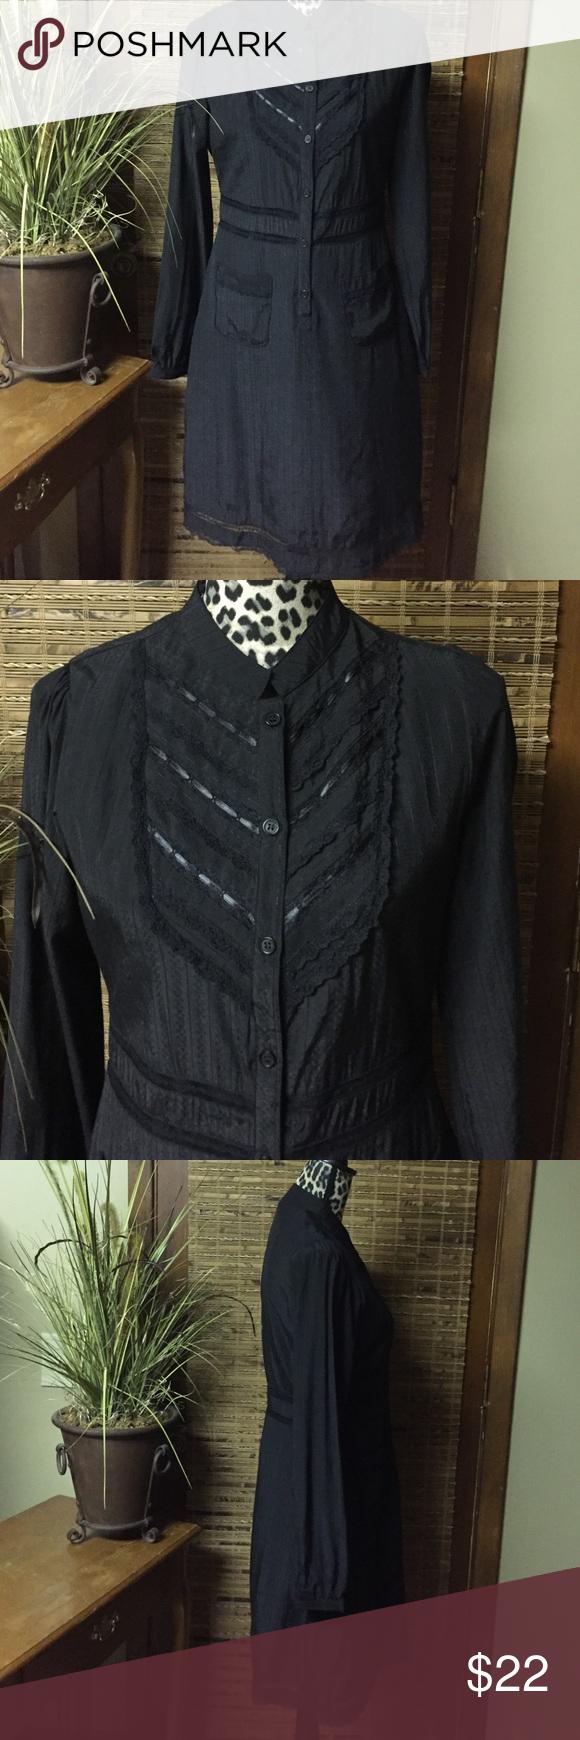 Salt & Pepper Dress Size Large black Salt & Pepper Dress.  Beautiful lace & ribbon detail.  Fully lined.  60% cotton, 40% polyester.  Item# D163. Salt & Pepper Dresses